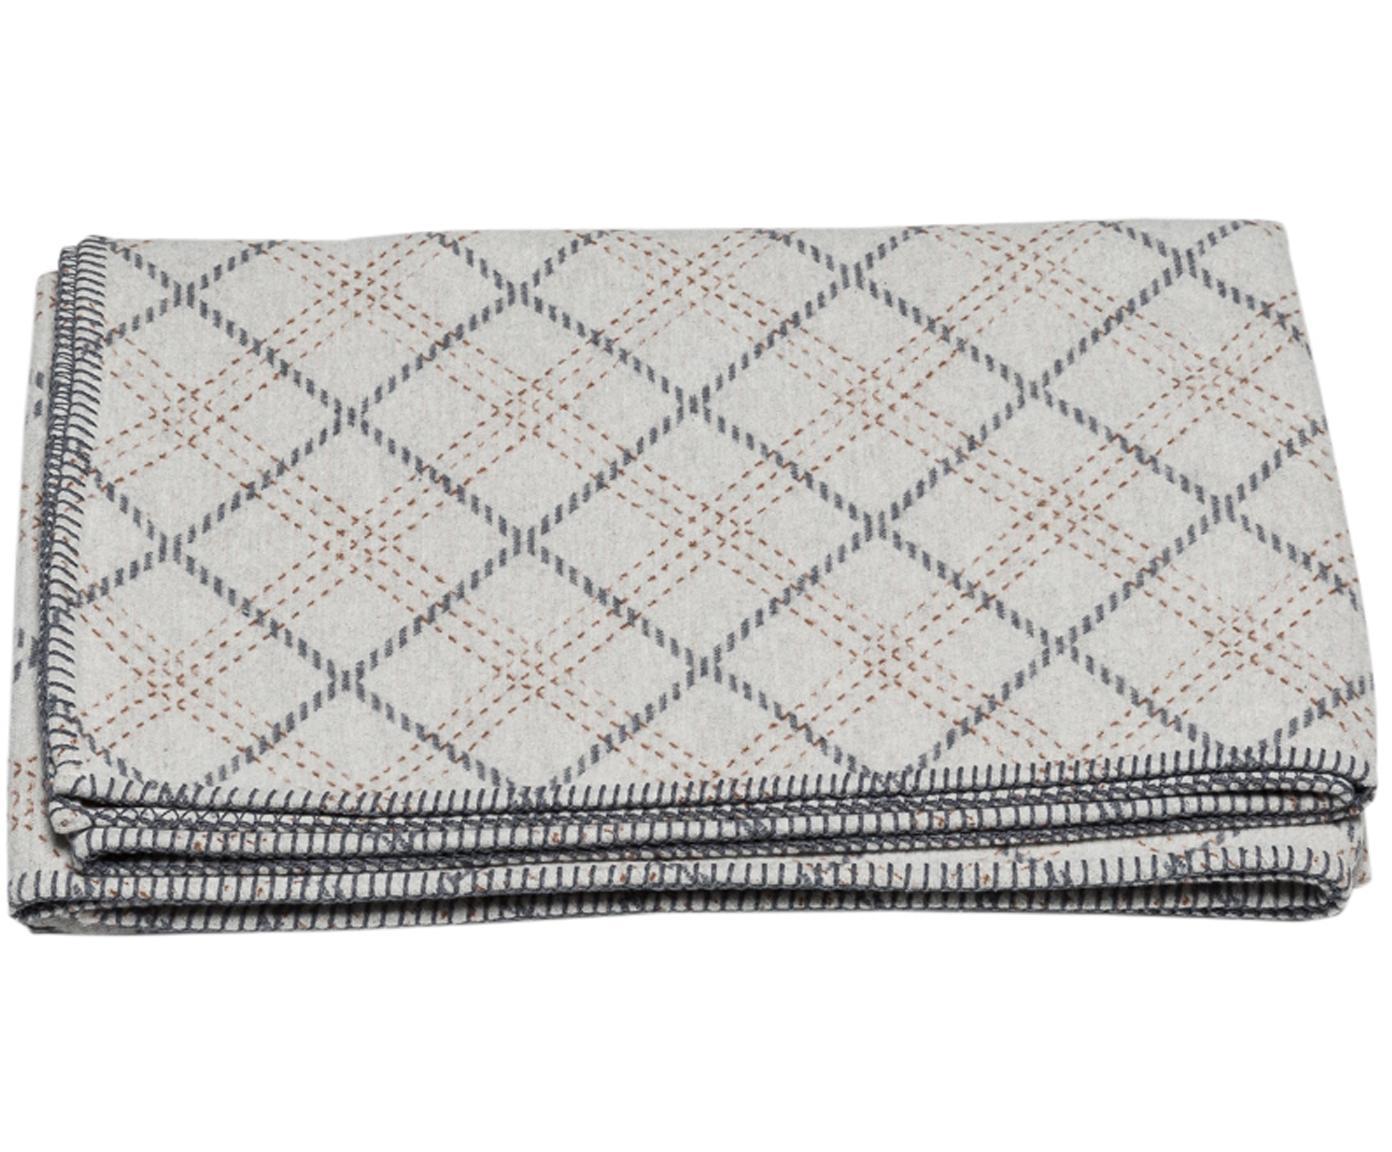 Plaid Karol mit Karos, Bezug: 85% Baumwolle, 8% Viskose, Hellgrau, Grau, Beige, 140 x 200 cm